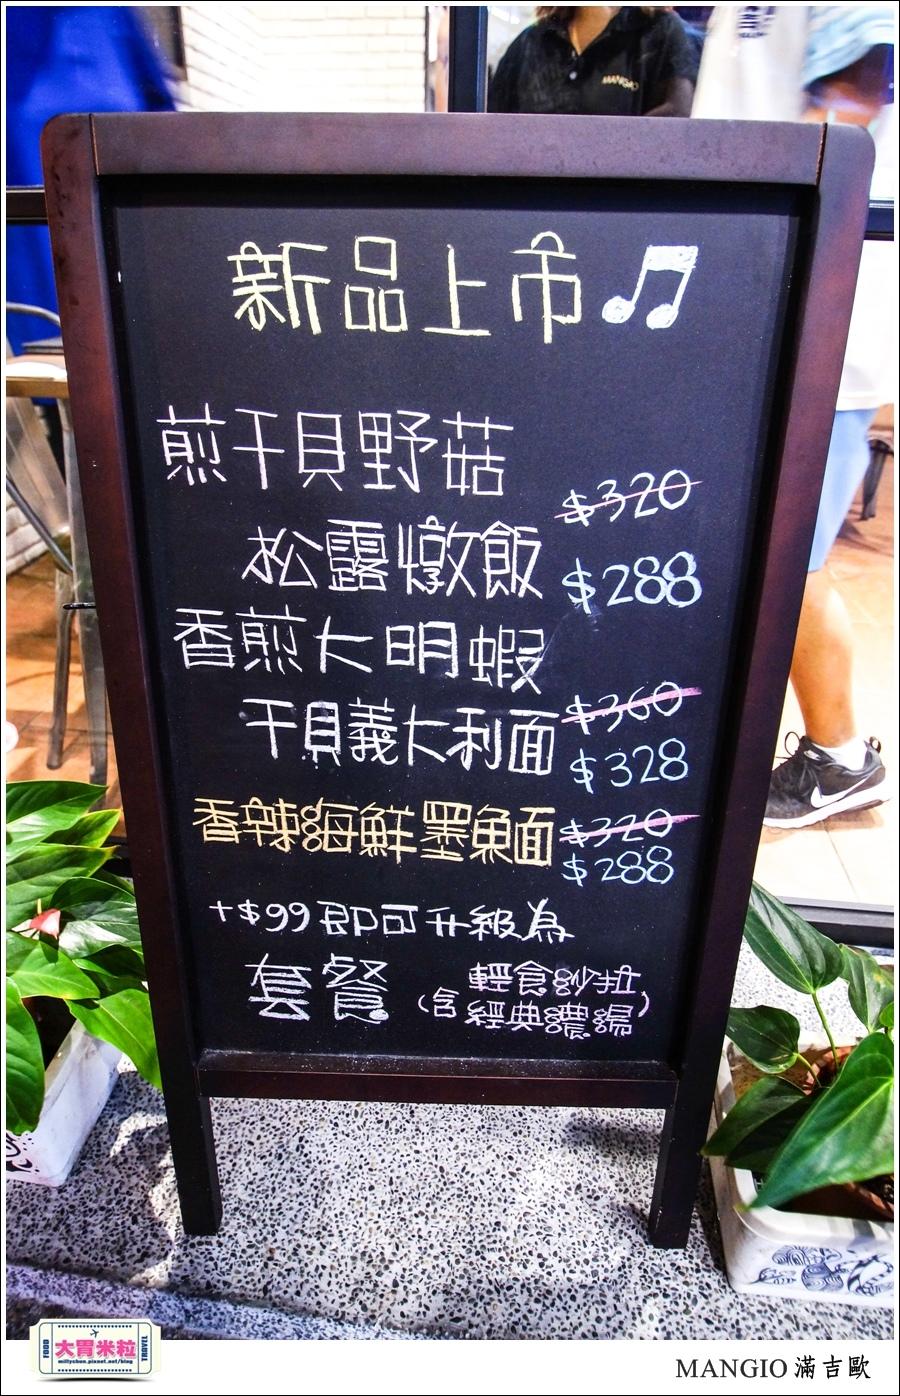 MANGiO Bistro 滿吉歐義式樂活餐酒館@台北餐酒館推薦@大胃米粒0004.jpg